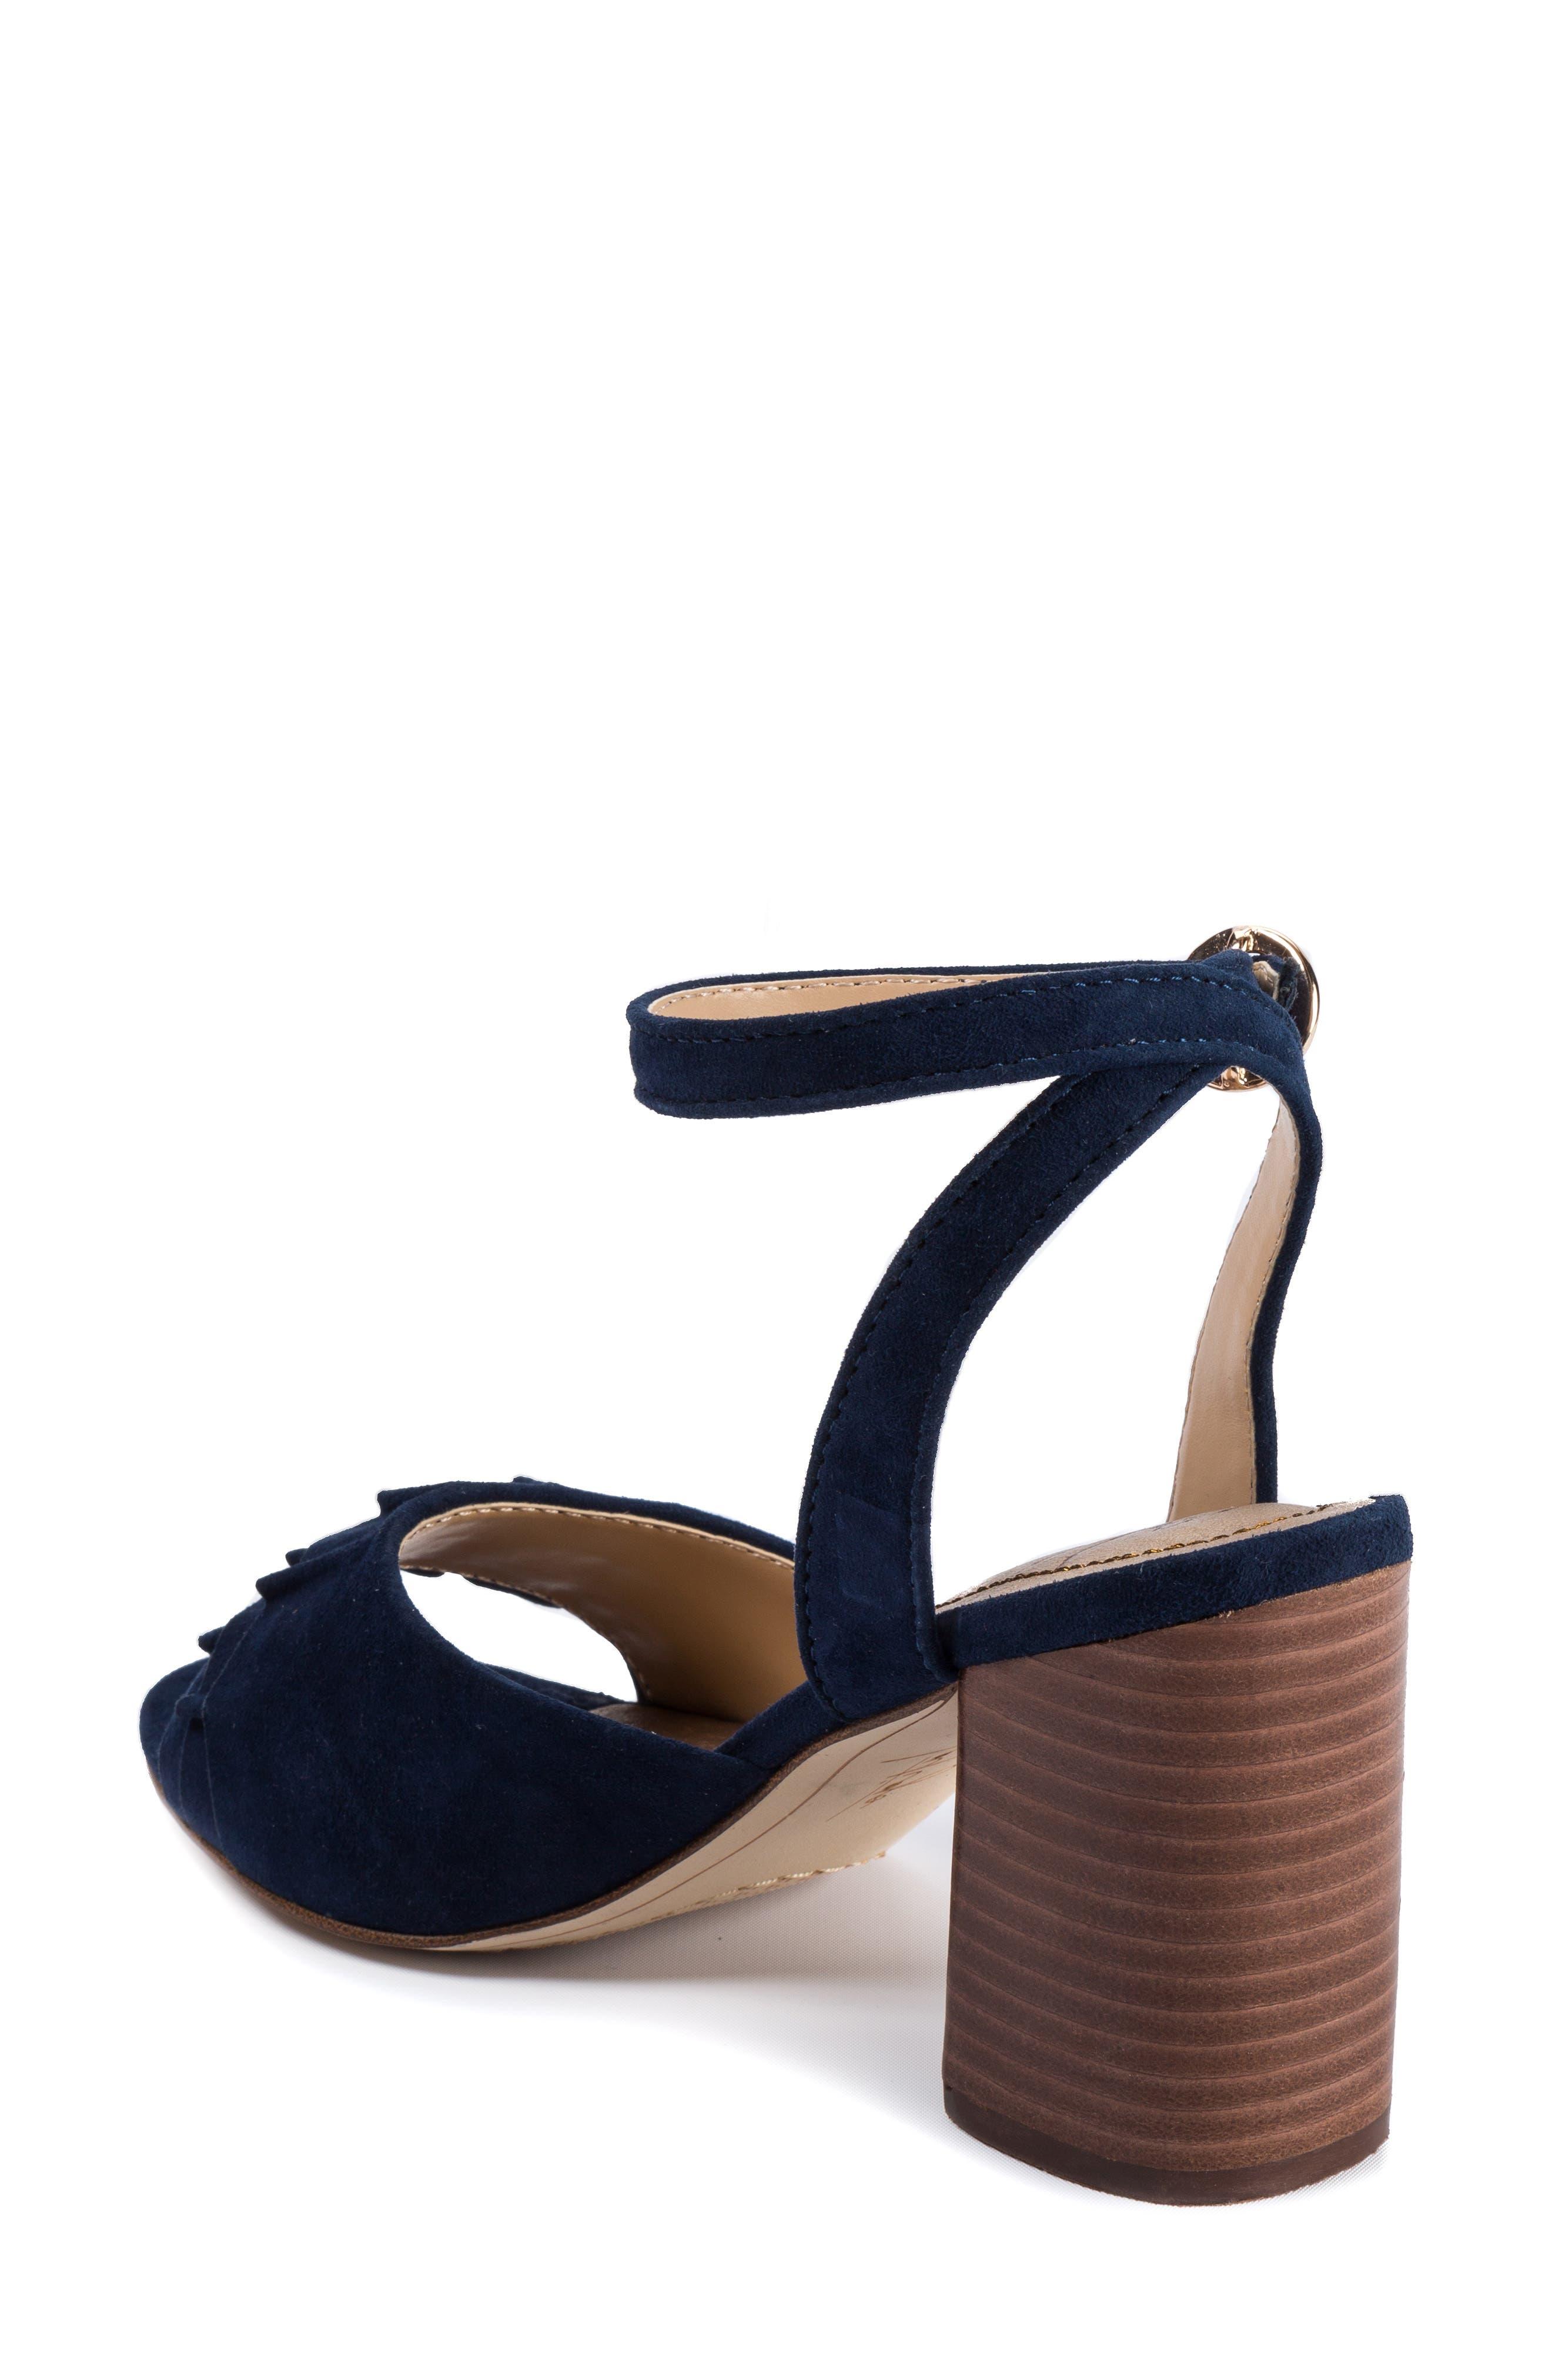 LATIGO, Idelle Ankle Strap Sandal, Alternate thumbnail 2, color, 410